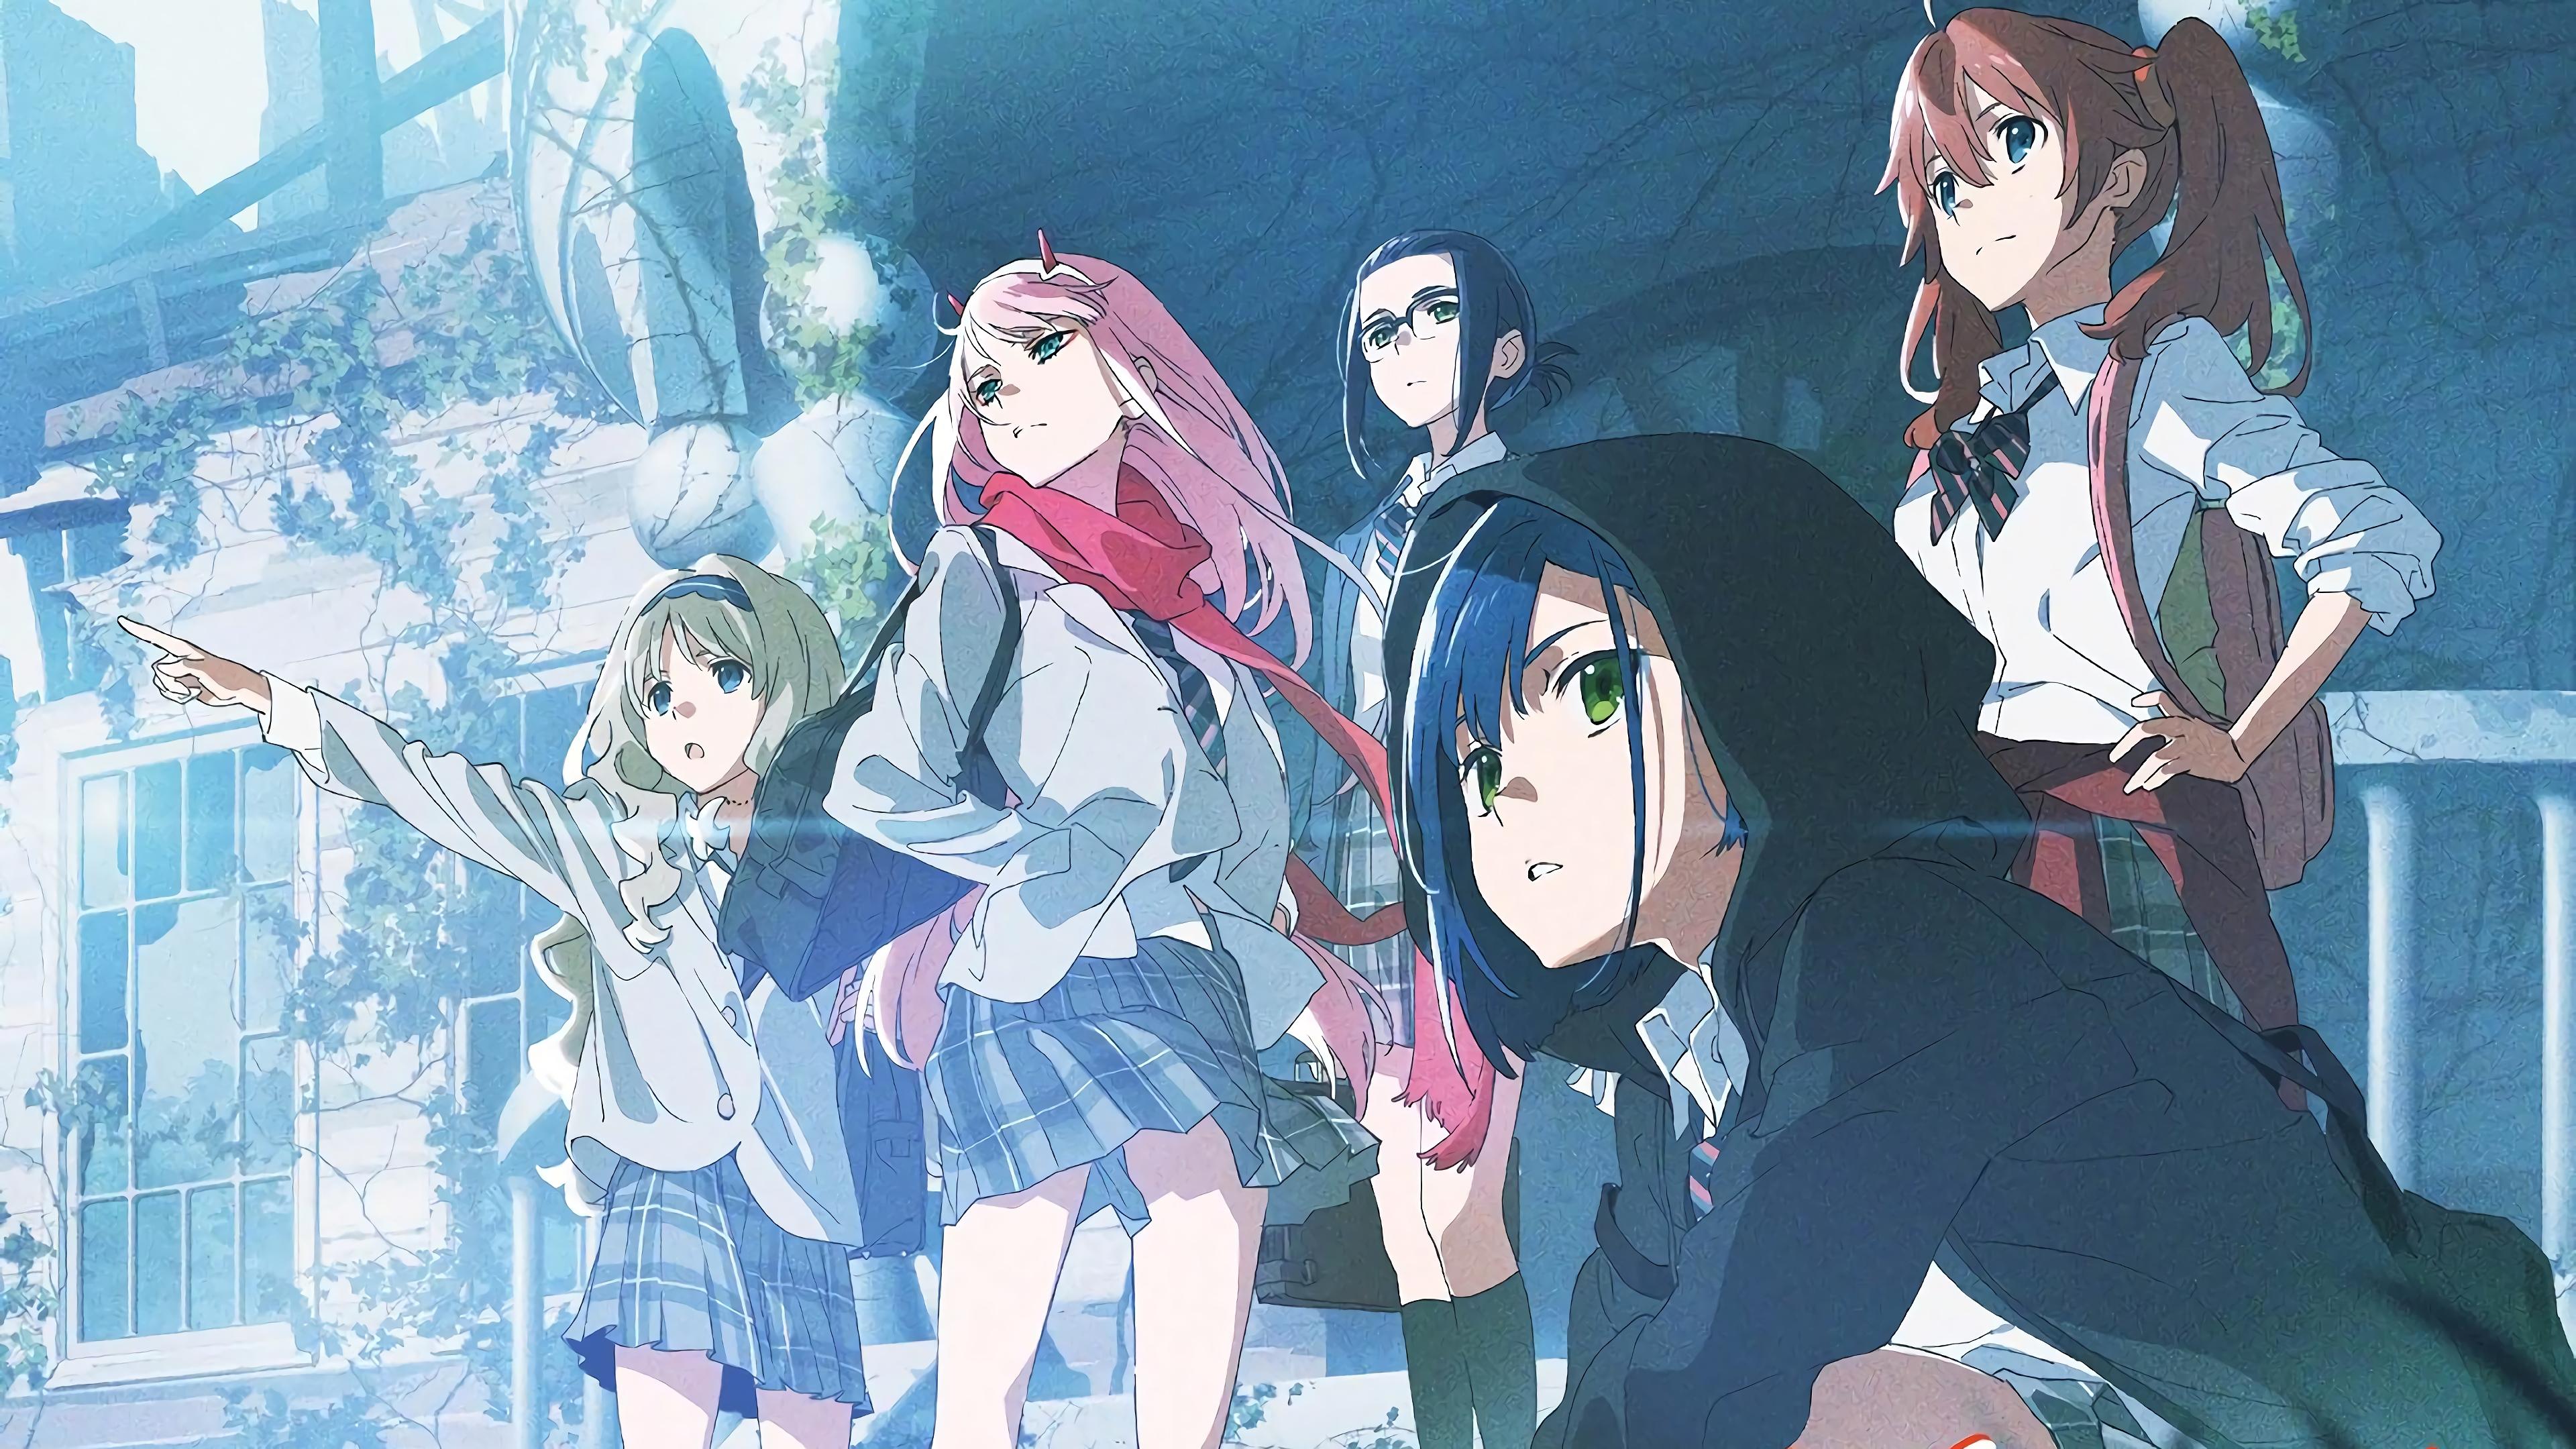 Anime 3840x2160 Ichigo (Darling in the FranXX) Code:196 (Ikuno) anime Zero Two (Darling in the FranXX) Darling in the FranXX Code:556 (Kokoro) Code:390 (Miku)